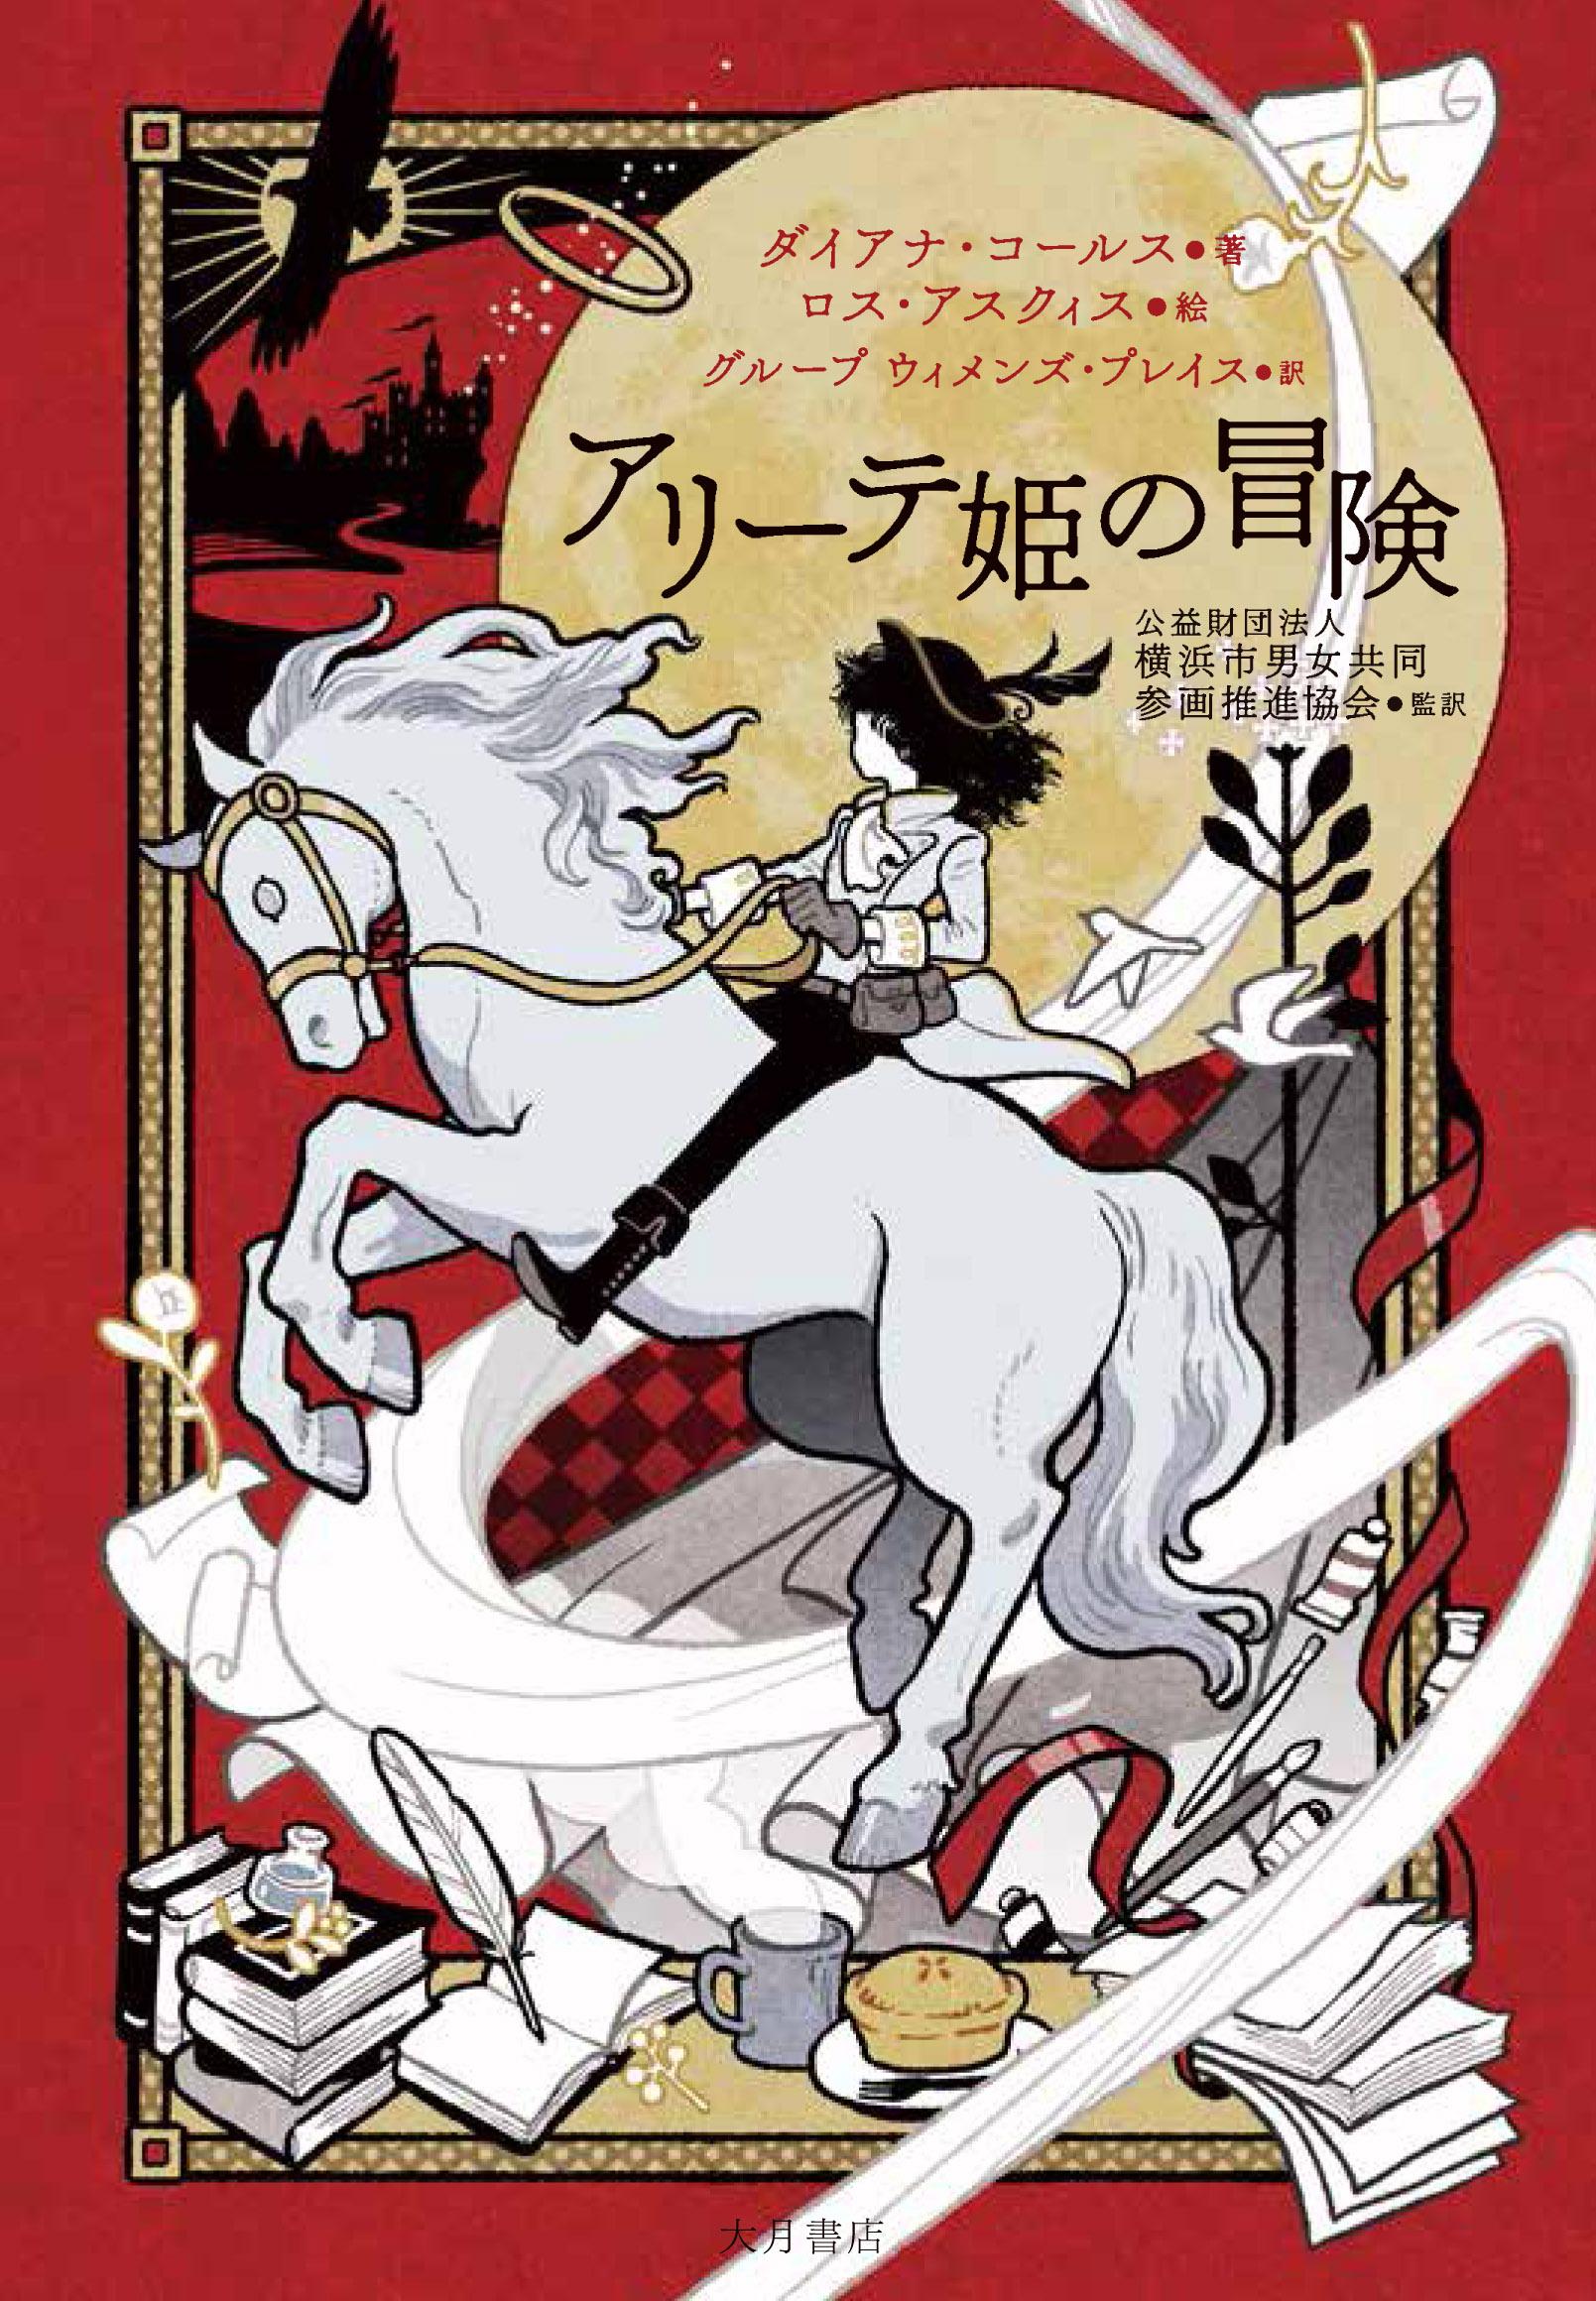 『アリーテ姫の冒険』写真